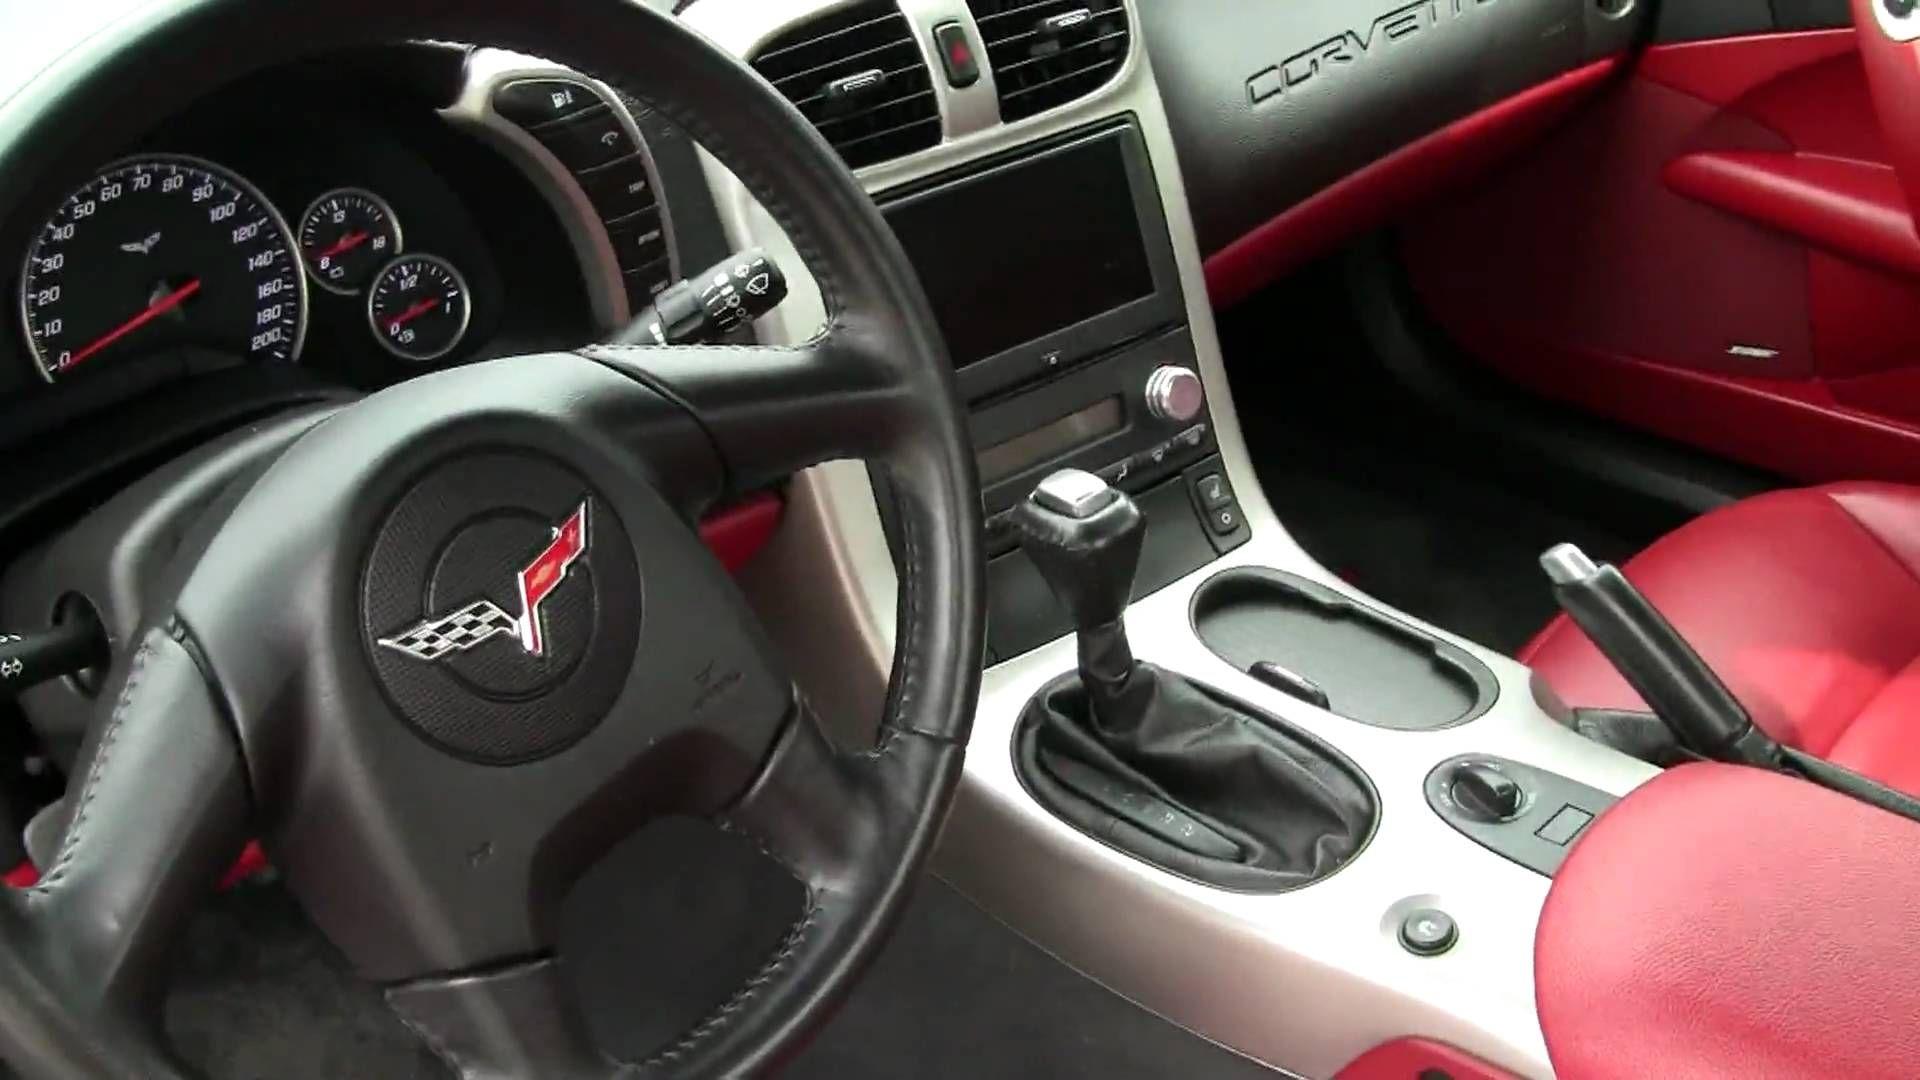 2005 C6 Chevrolet Corvette Specifications, VIN, & Options